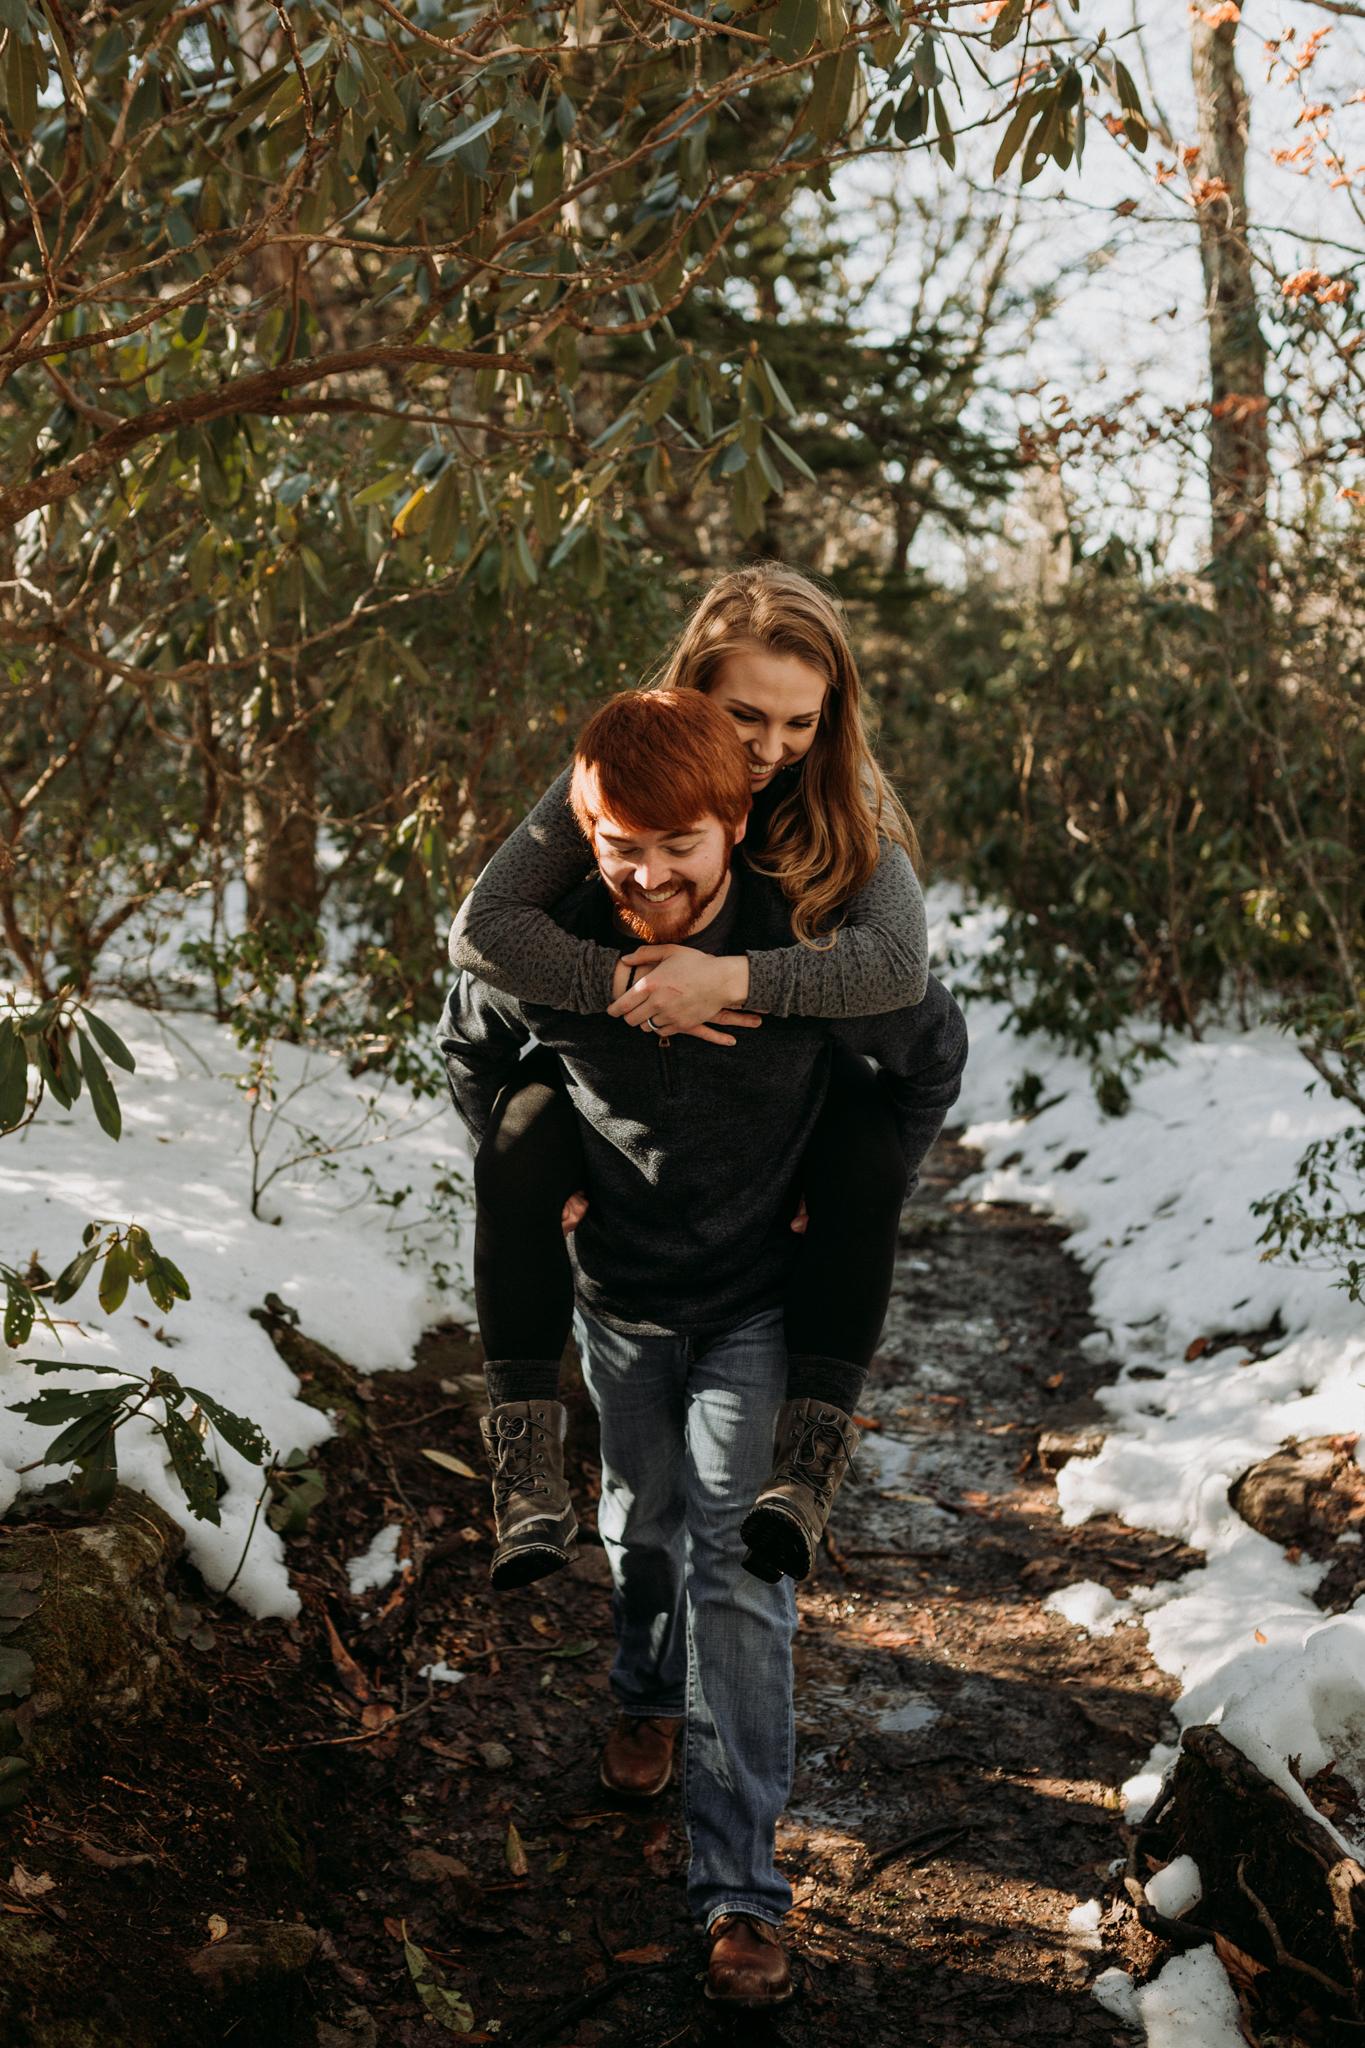 MonicaLeavellPhoto-AshleyMitch-NorthCarolina-Adventure-Engagement-Photographer-8.jpg